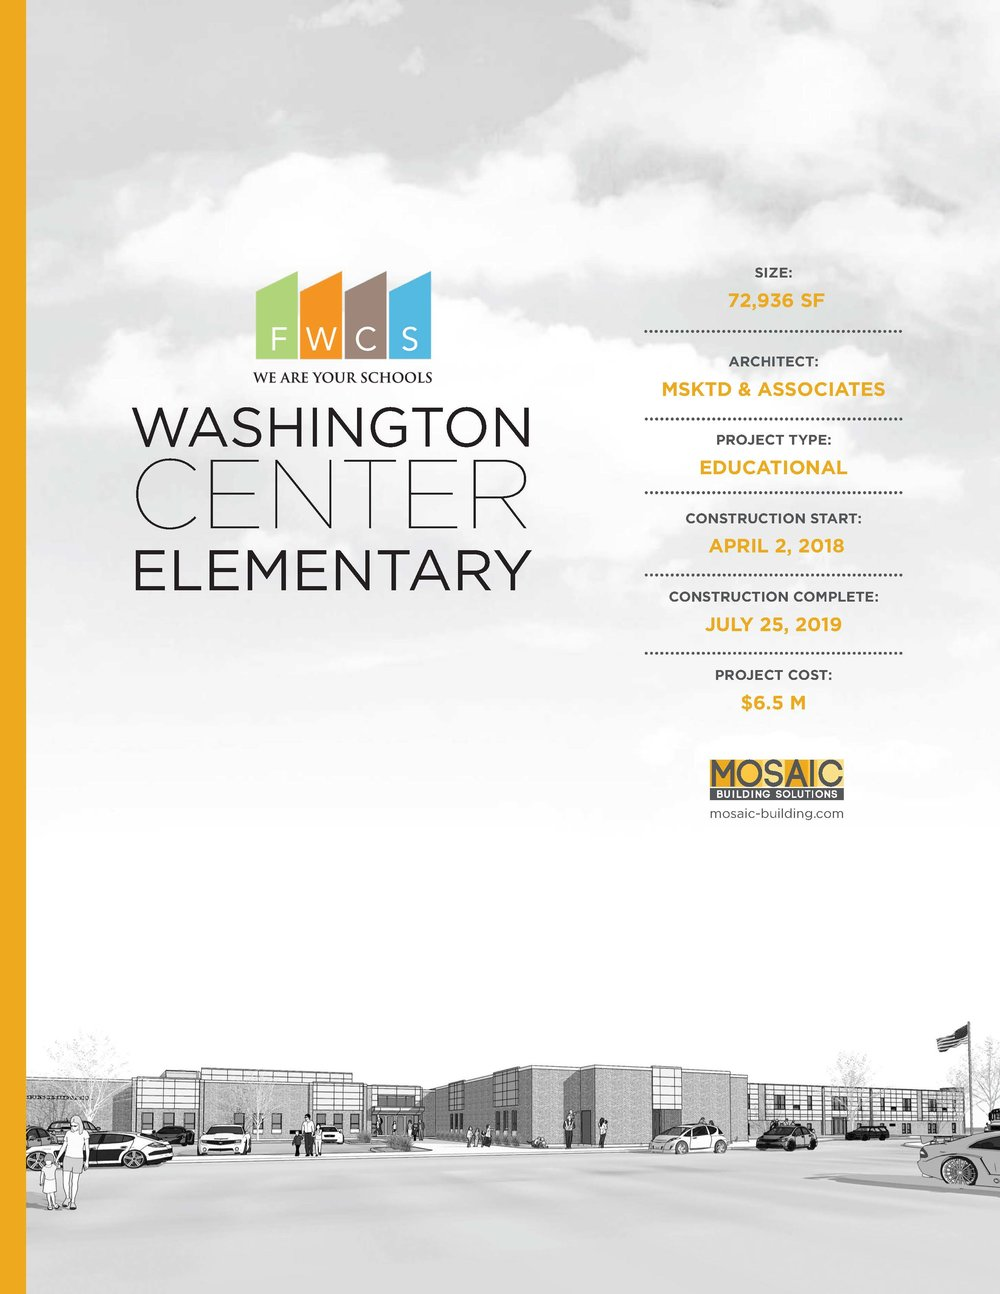 FWCS_Washington_Center_Project_Sheet.jpg